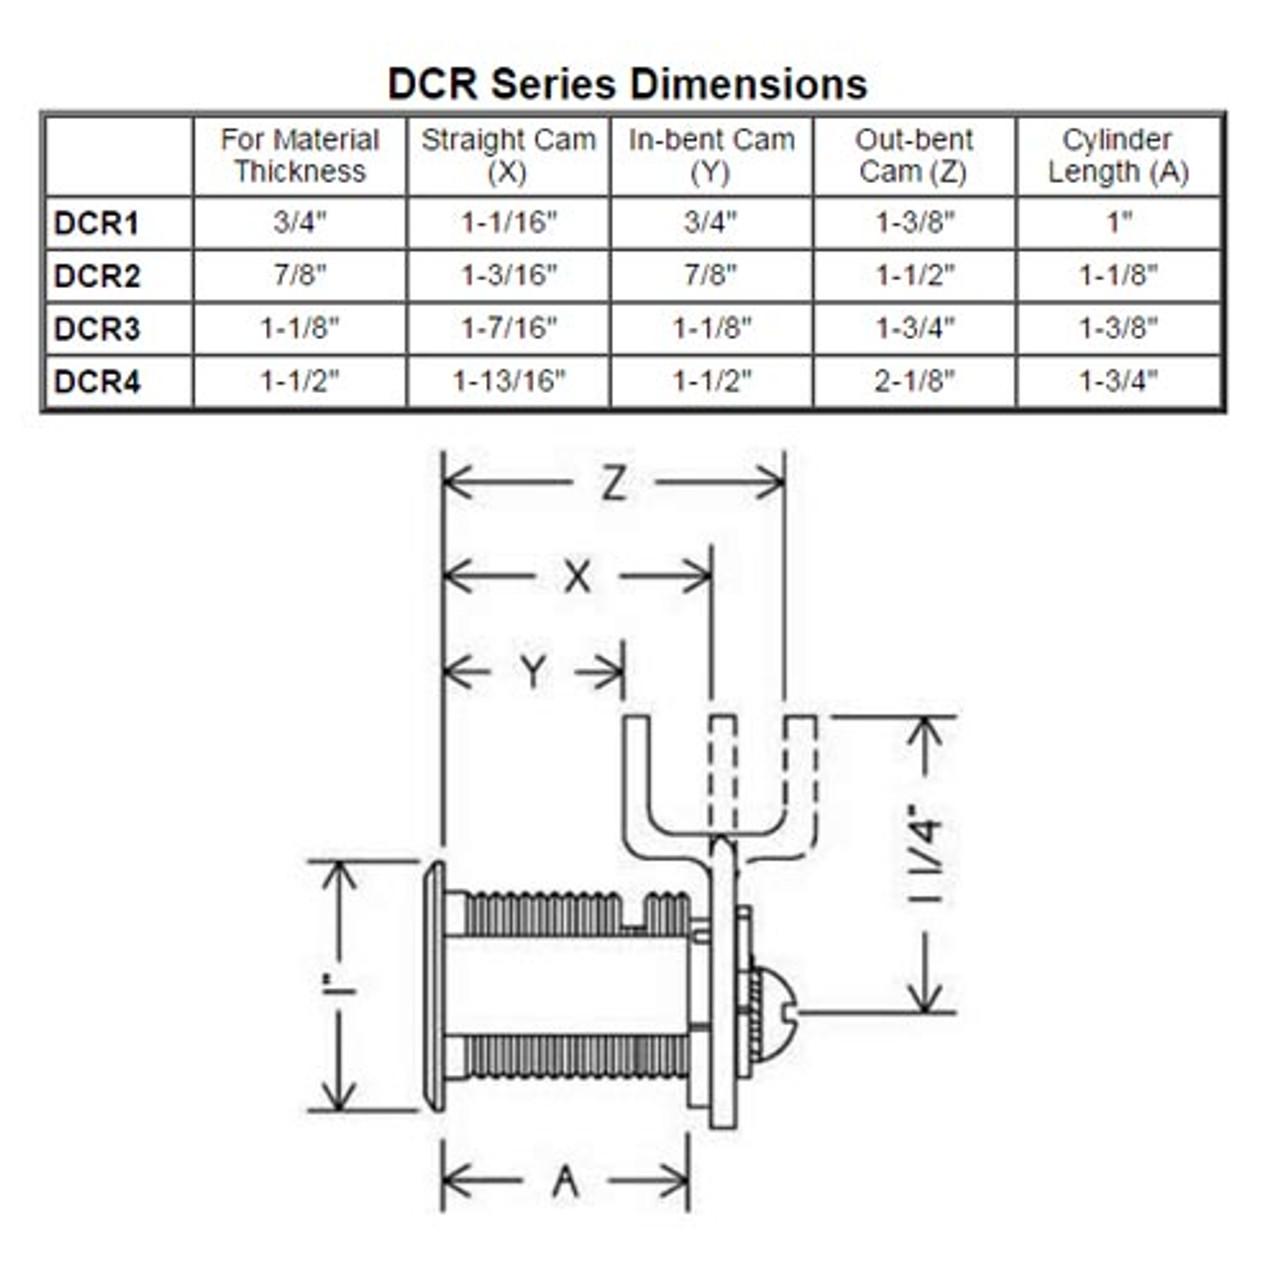 Olympus DCR4-KA4T2-26D R Series Keyed Alike Reversible Cam Lock in Satin Chrome